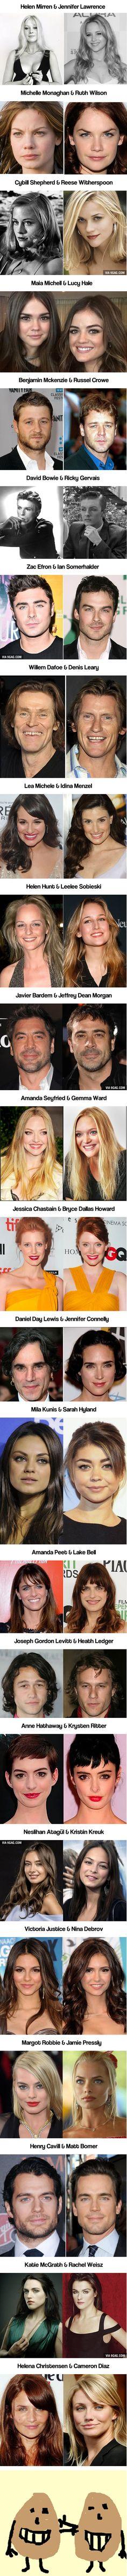 48 celebrity look alikes